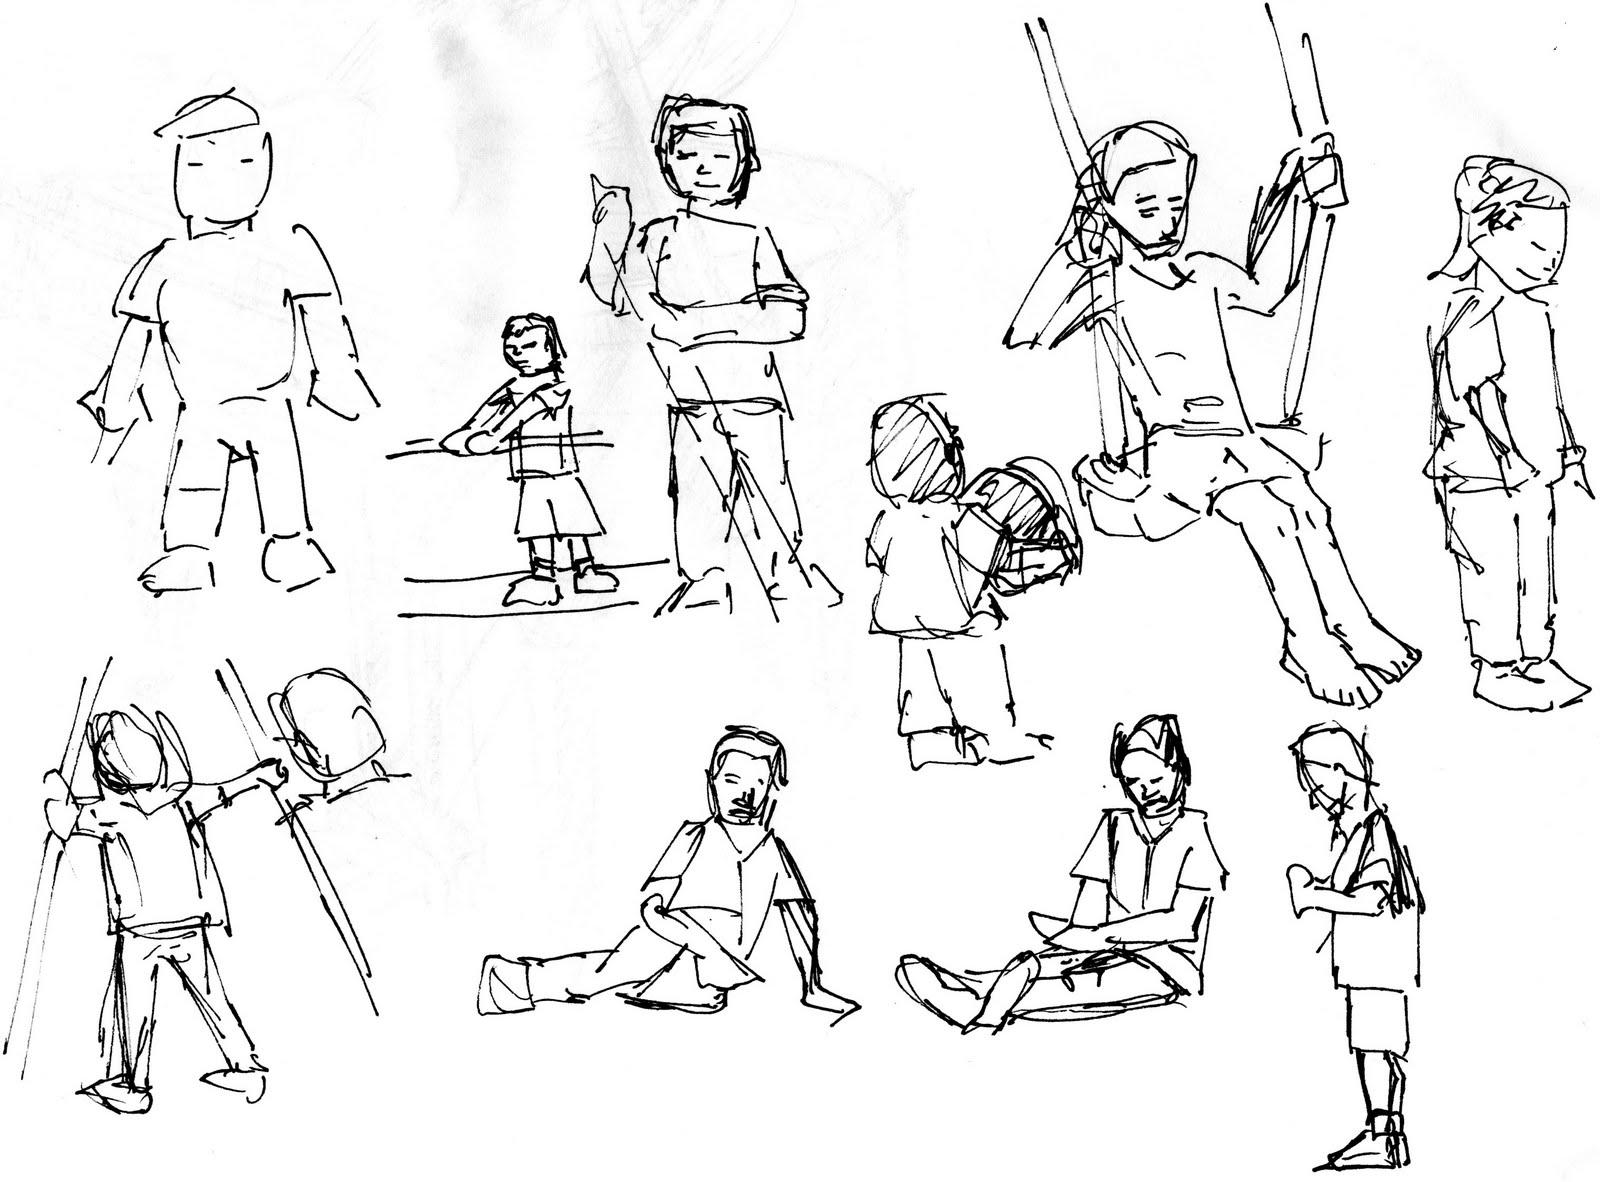 1600x1182 Kodomo No Hichildren's Dayhari Anak Anak Henri Daros's Blog